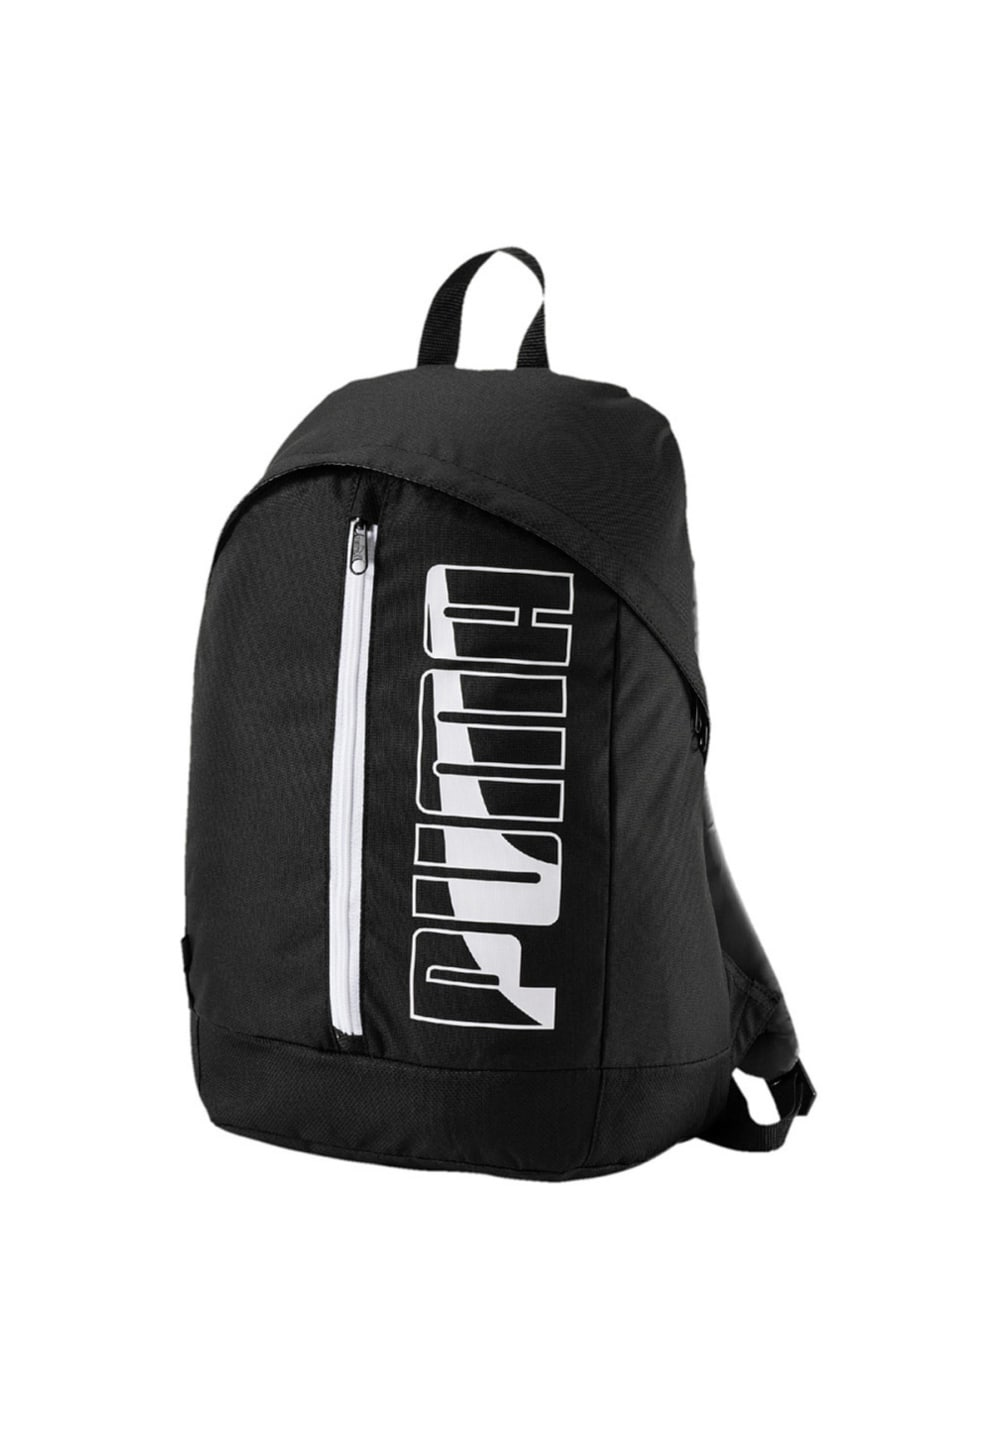 Puma Pioneer Backpack II Rucksäcke - Schwarz